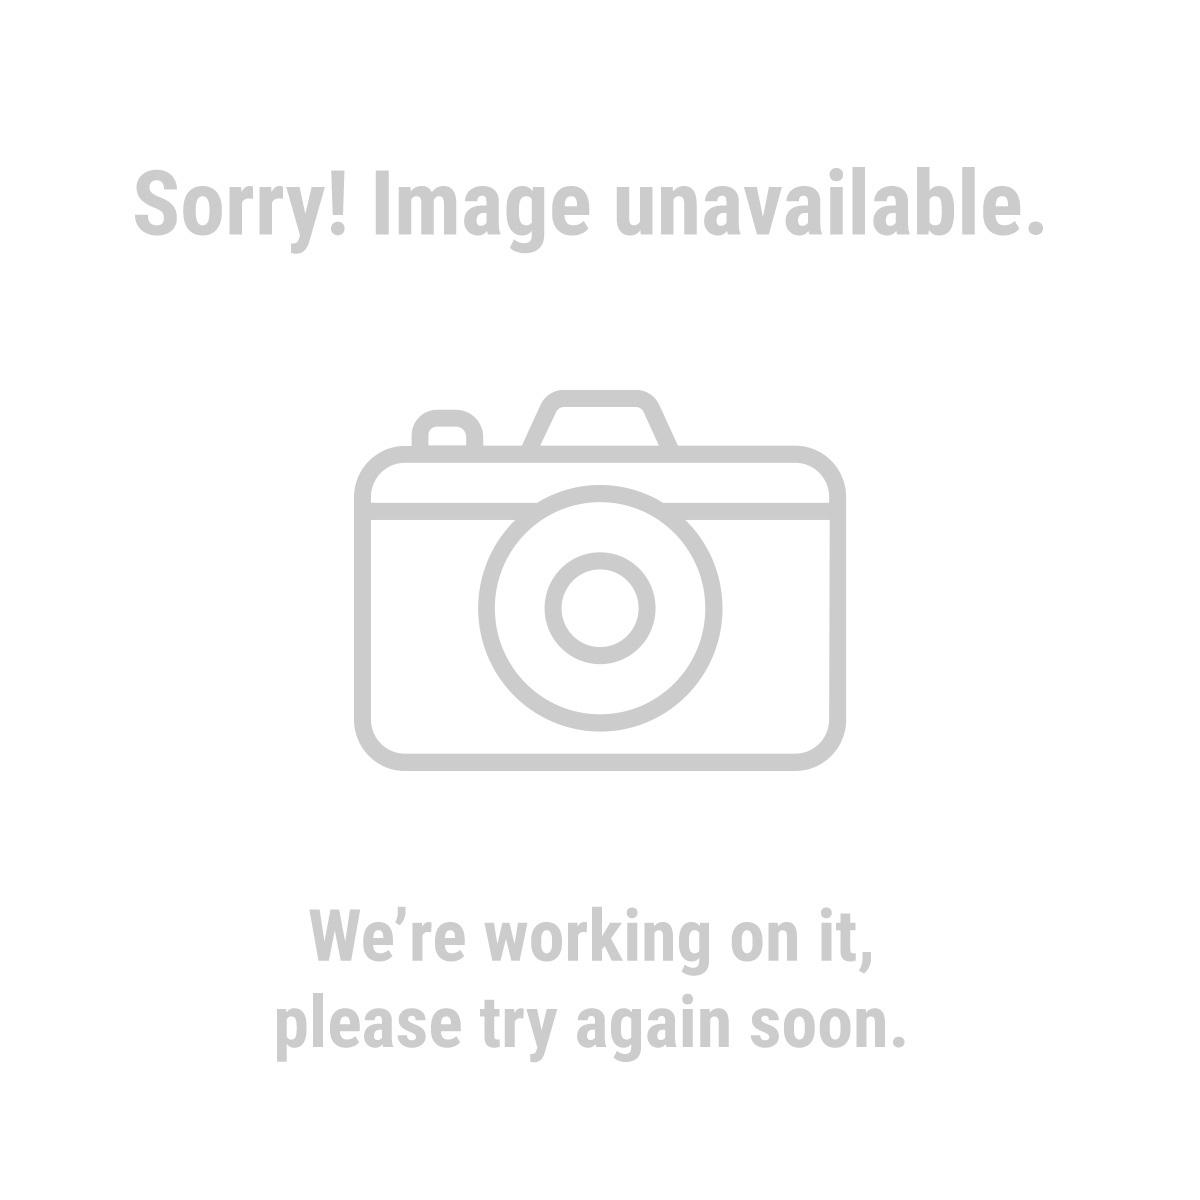 1500 Lb Capacity Atv Motorcycle Lift